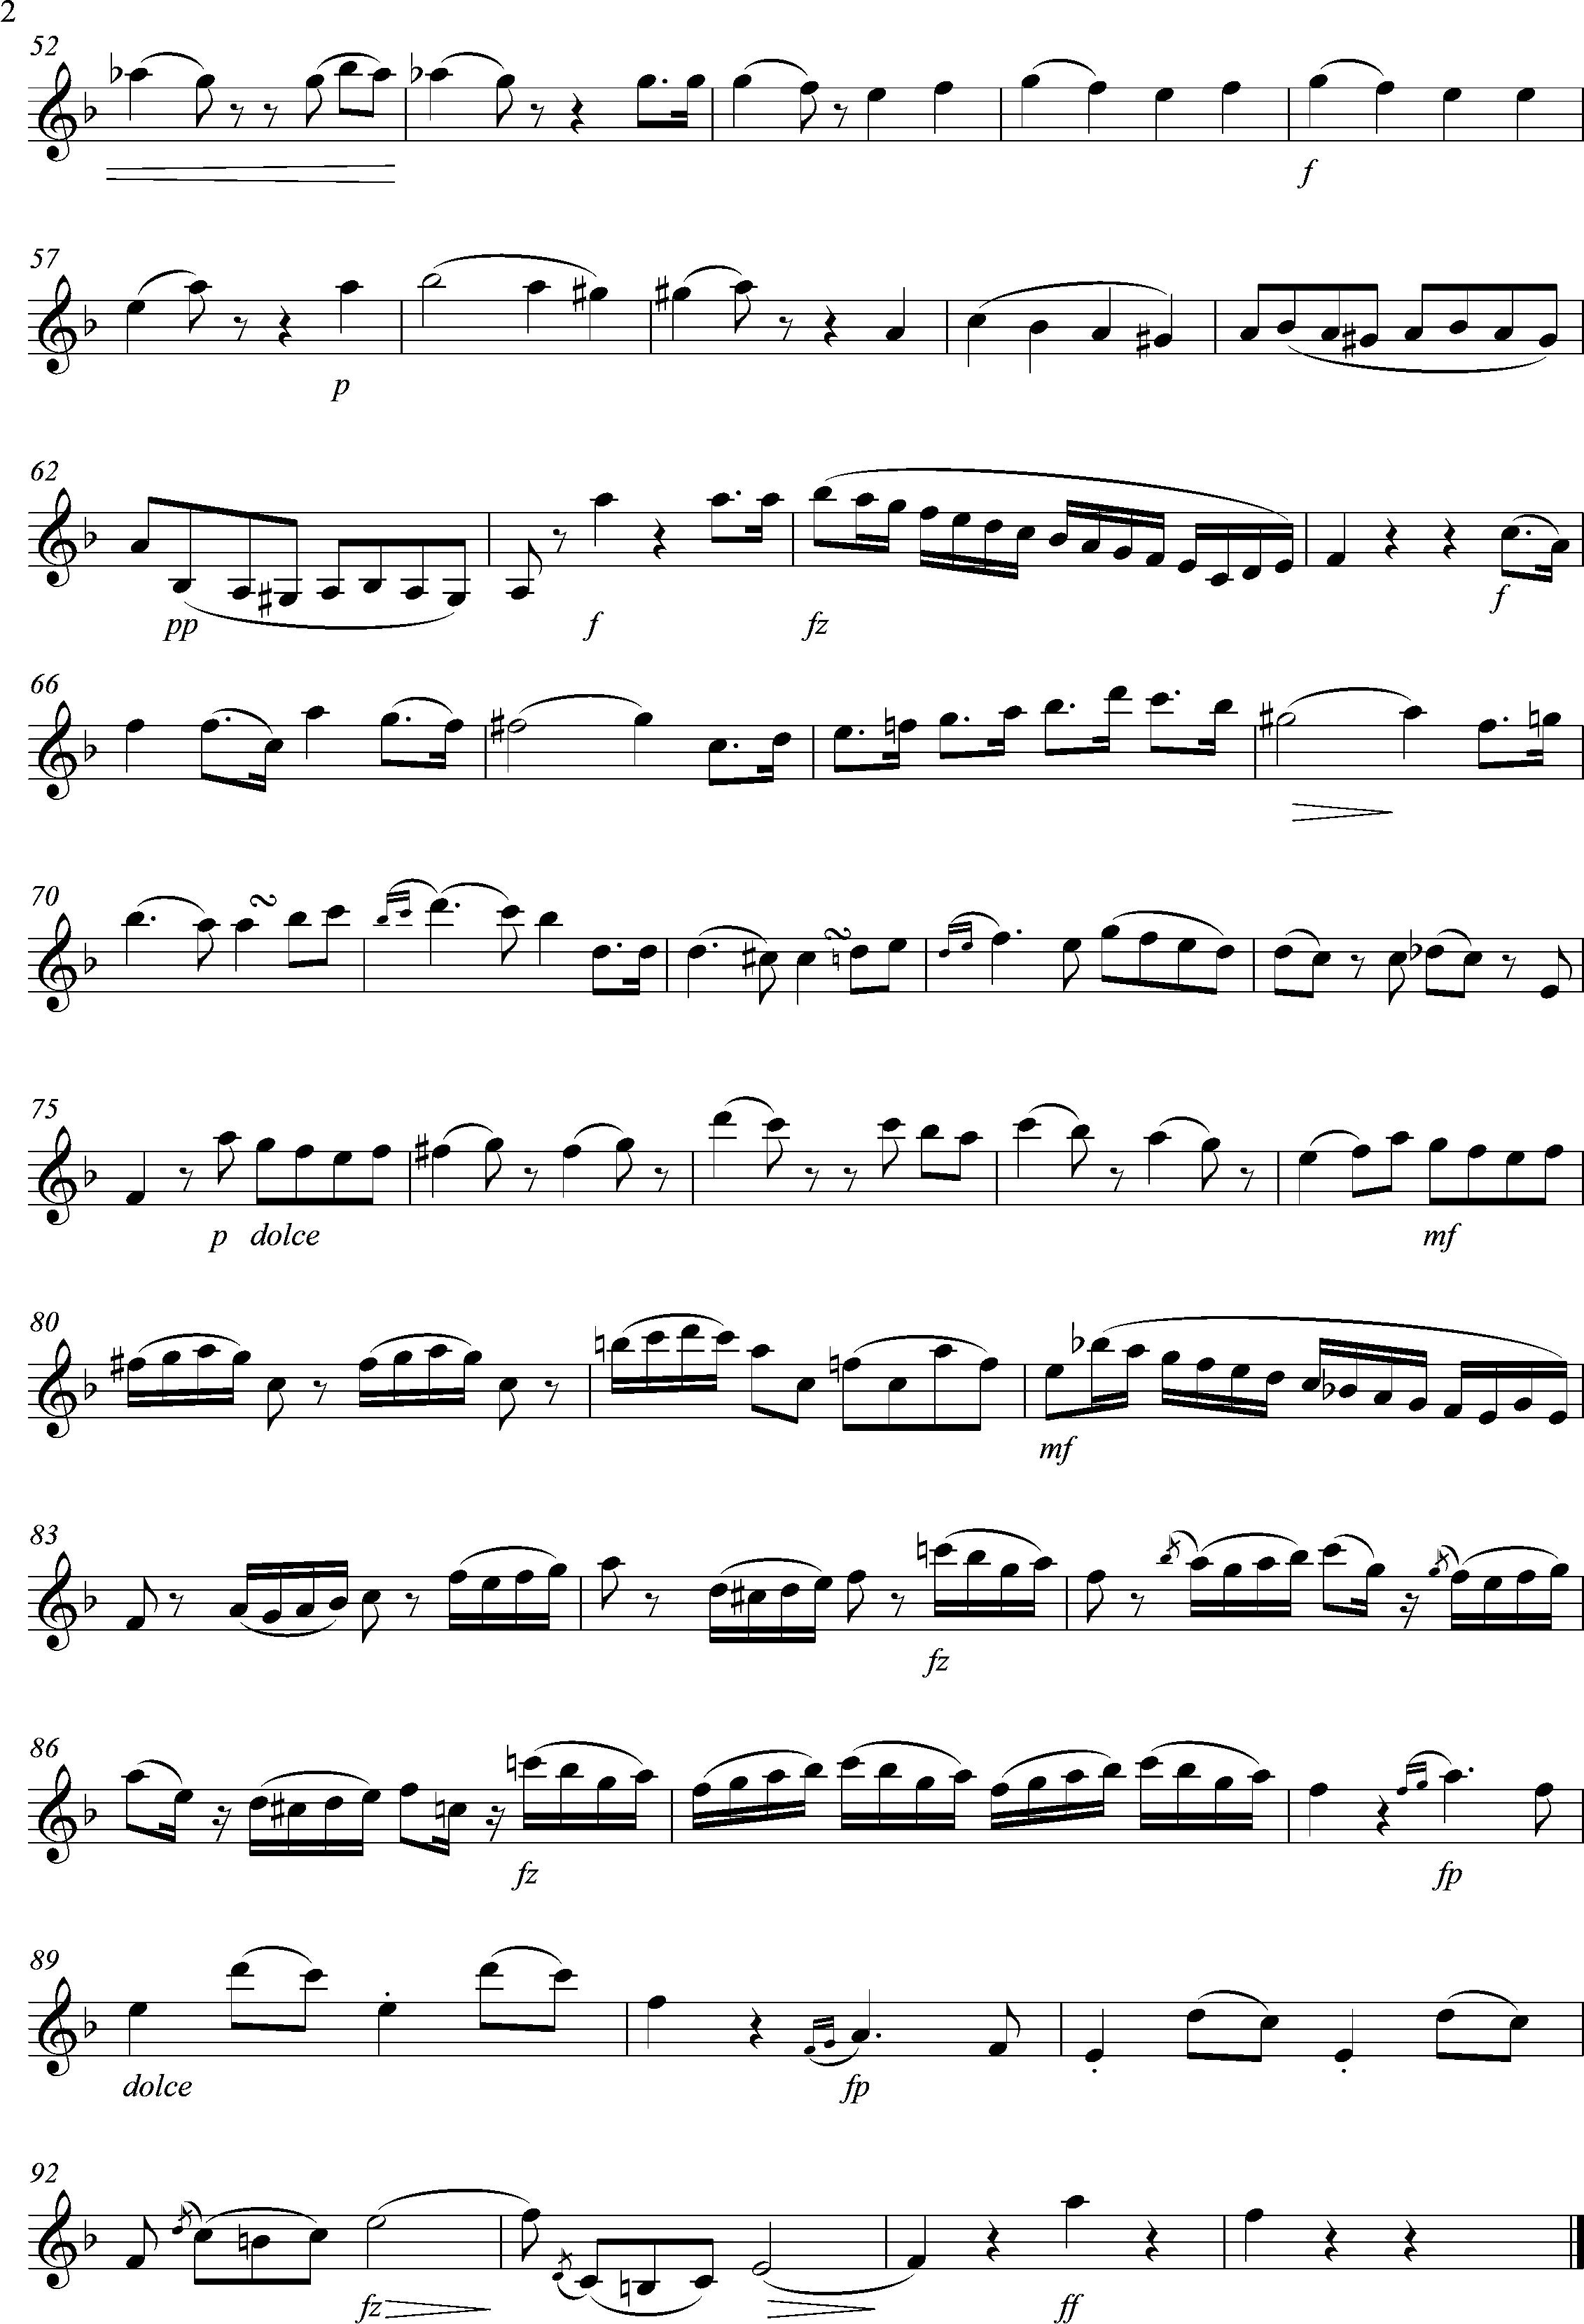 sonatine III,op151, Diabelli